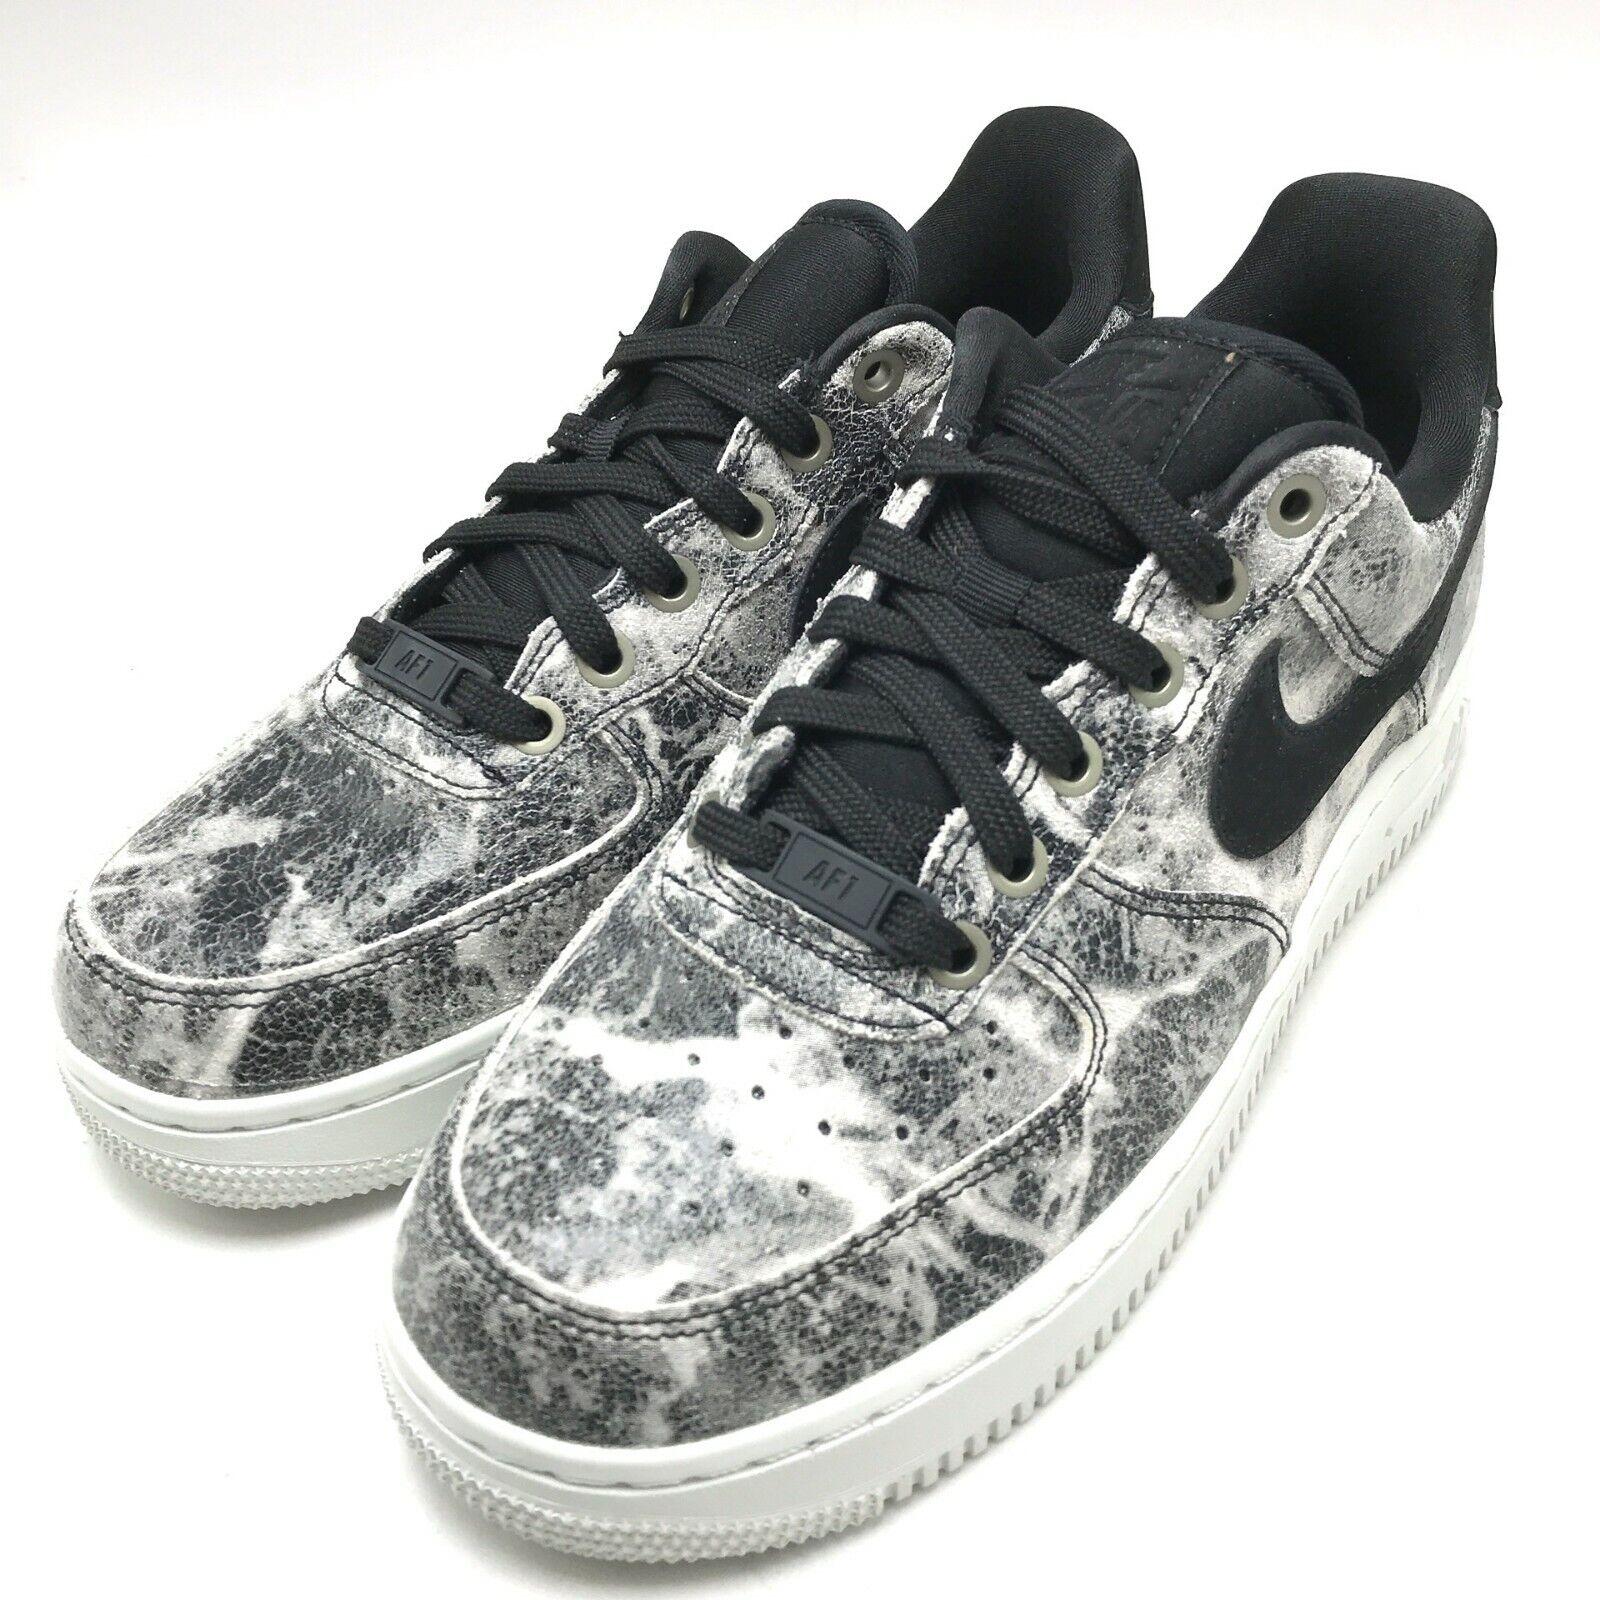 Nike Air Force 1 '07 LXX  Women's shoes Black Black-Metallic Pewter AO1017-001